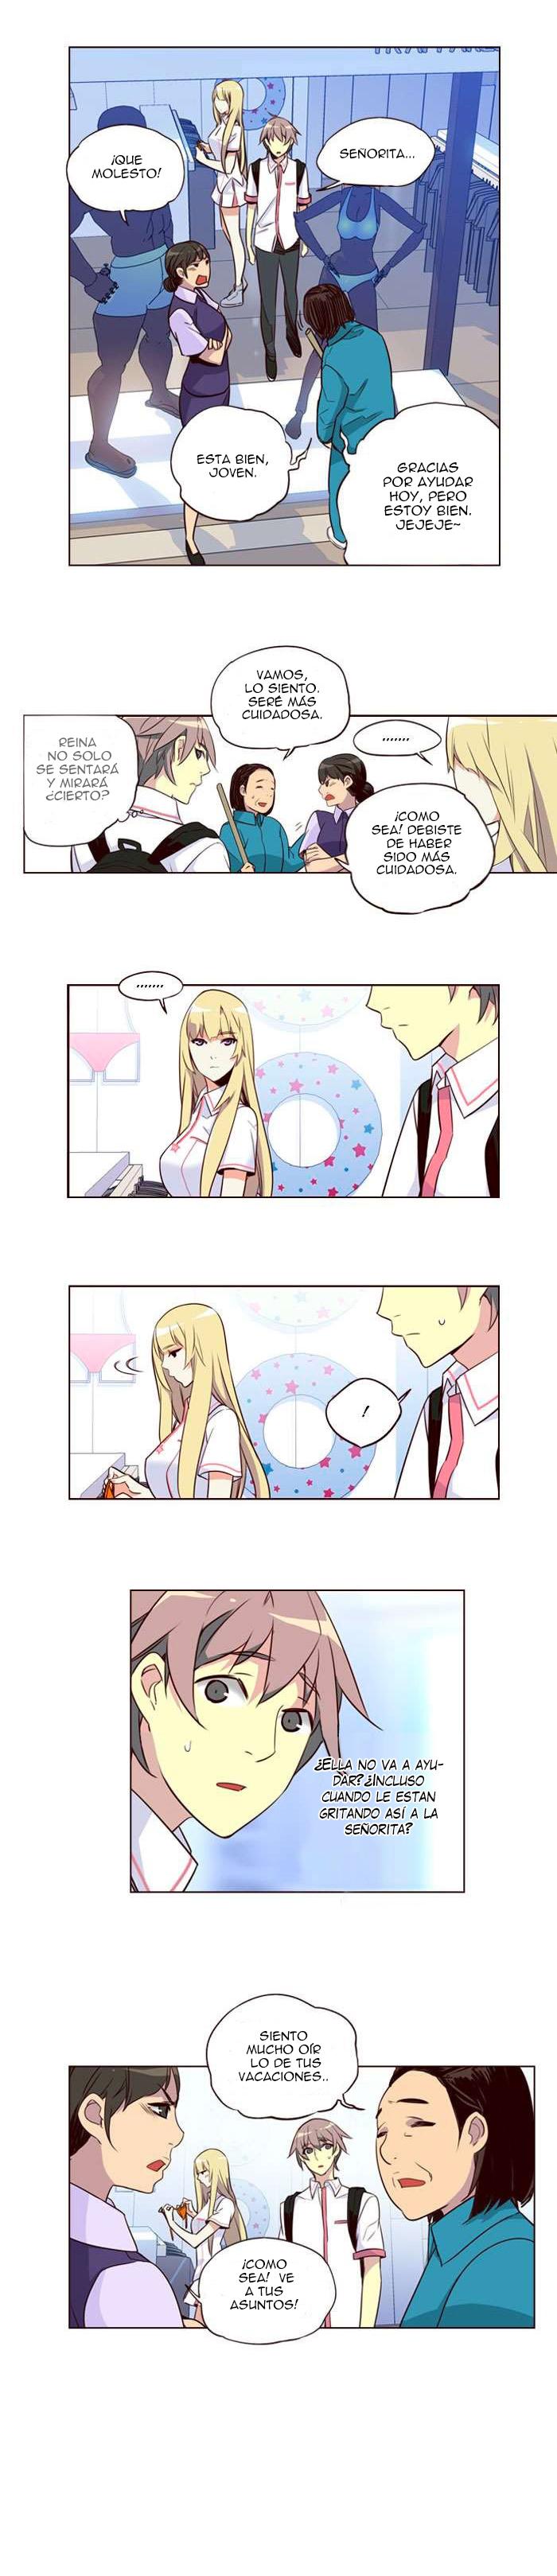 http://c5.ninemanga.com/es_manga/32/416/428936/63f73cf1450f9d04d966da4d2390c57c.jpg Page 3